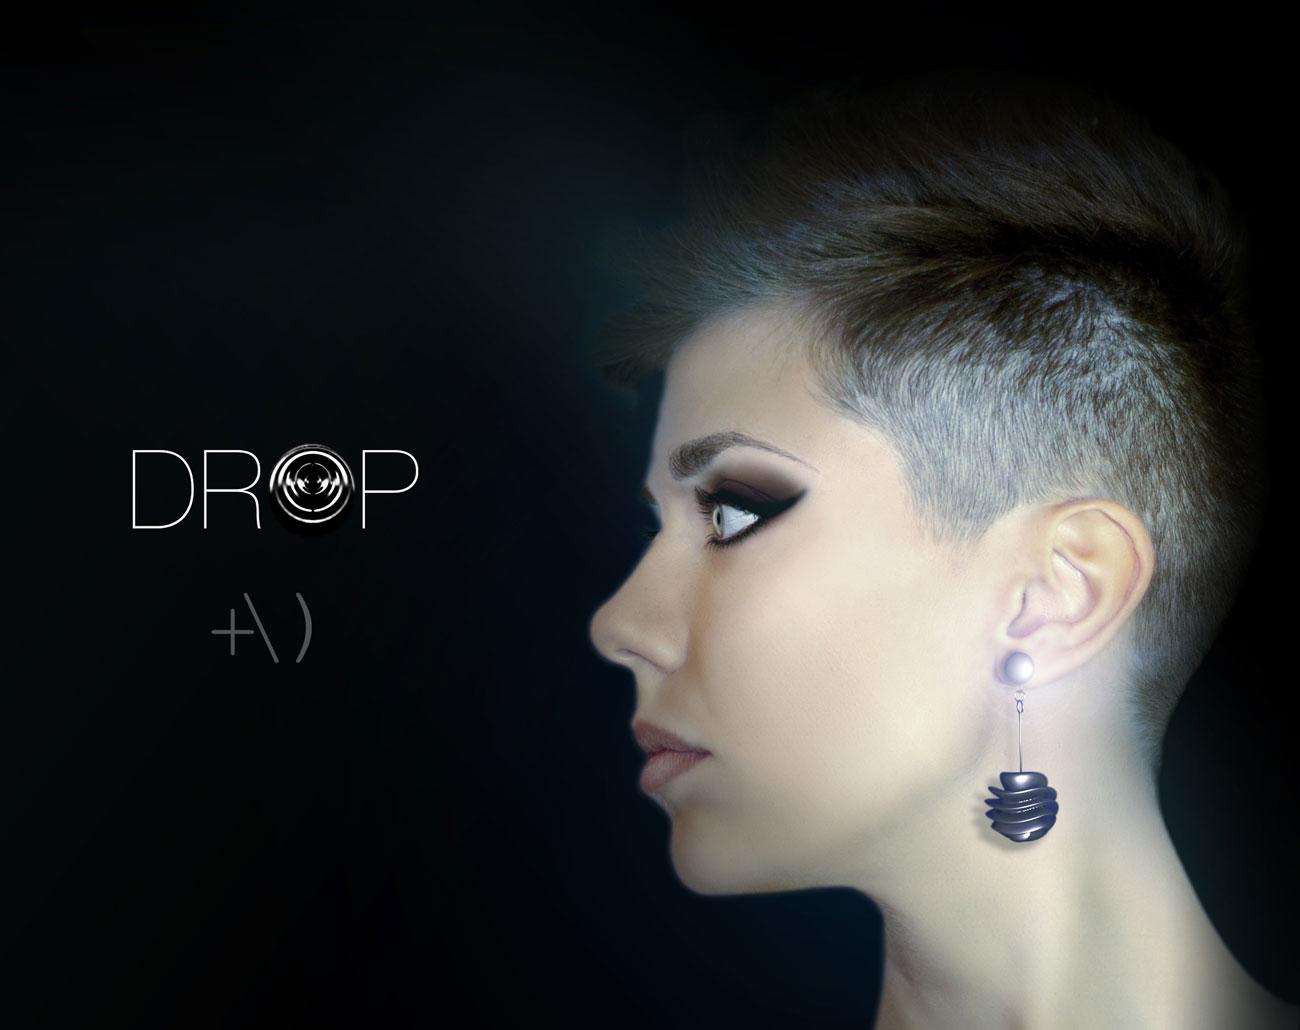 drop earings